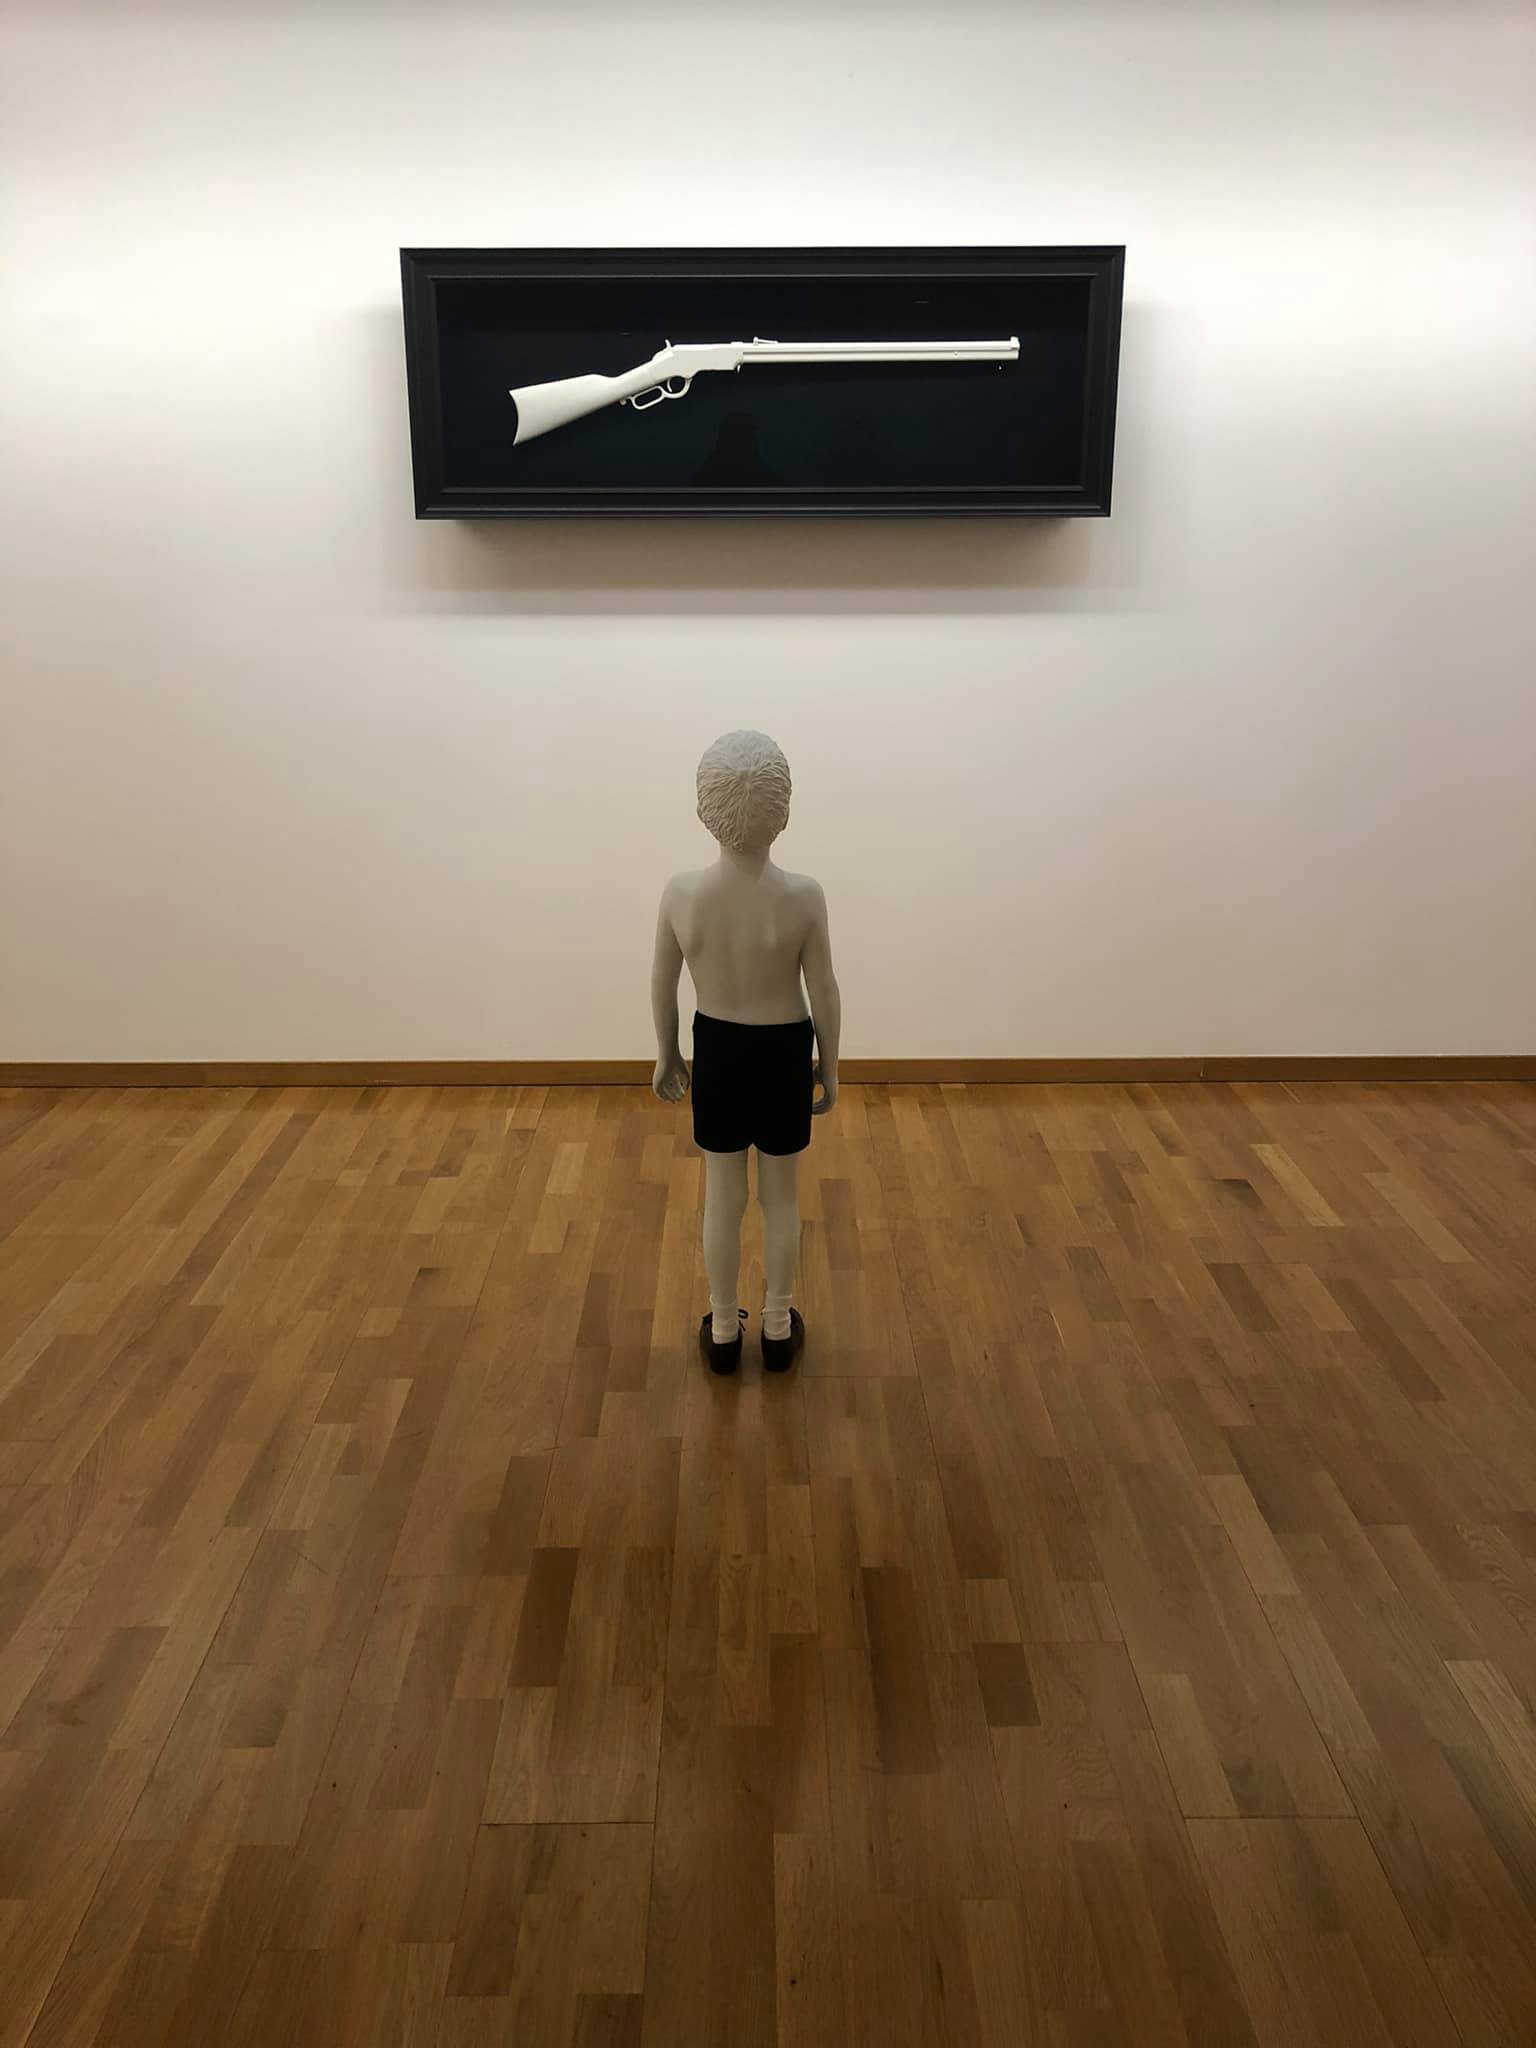 One day, Michael Elmgreen e Ingar Dragset, 2015